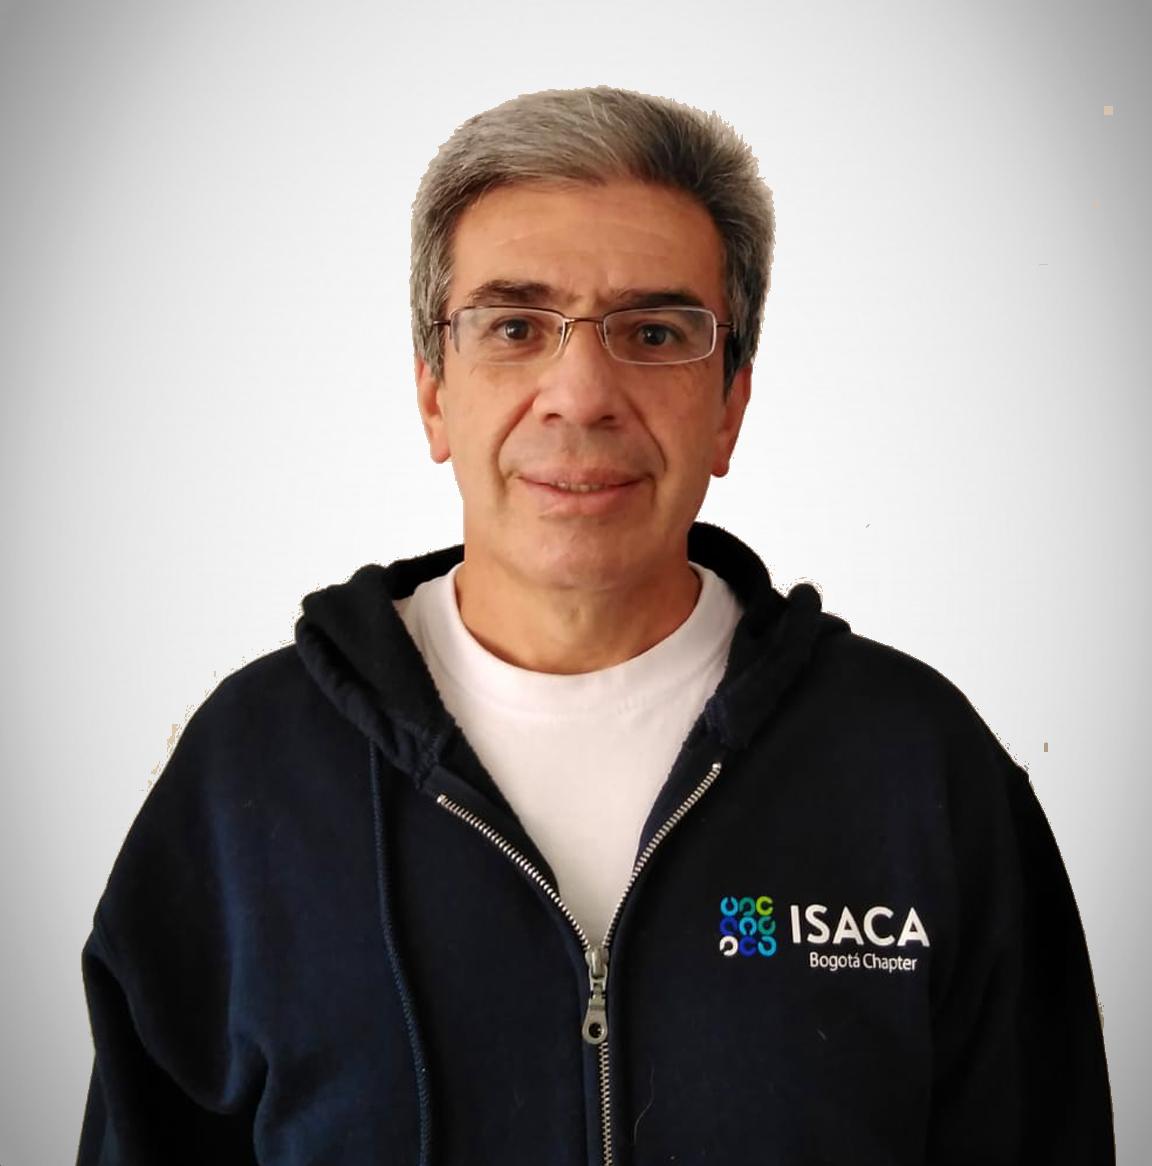 Luis Duarte ISACA Bogotá